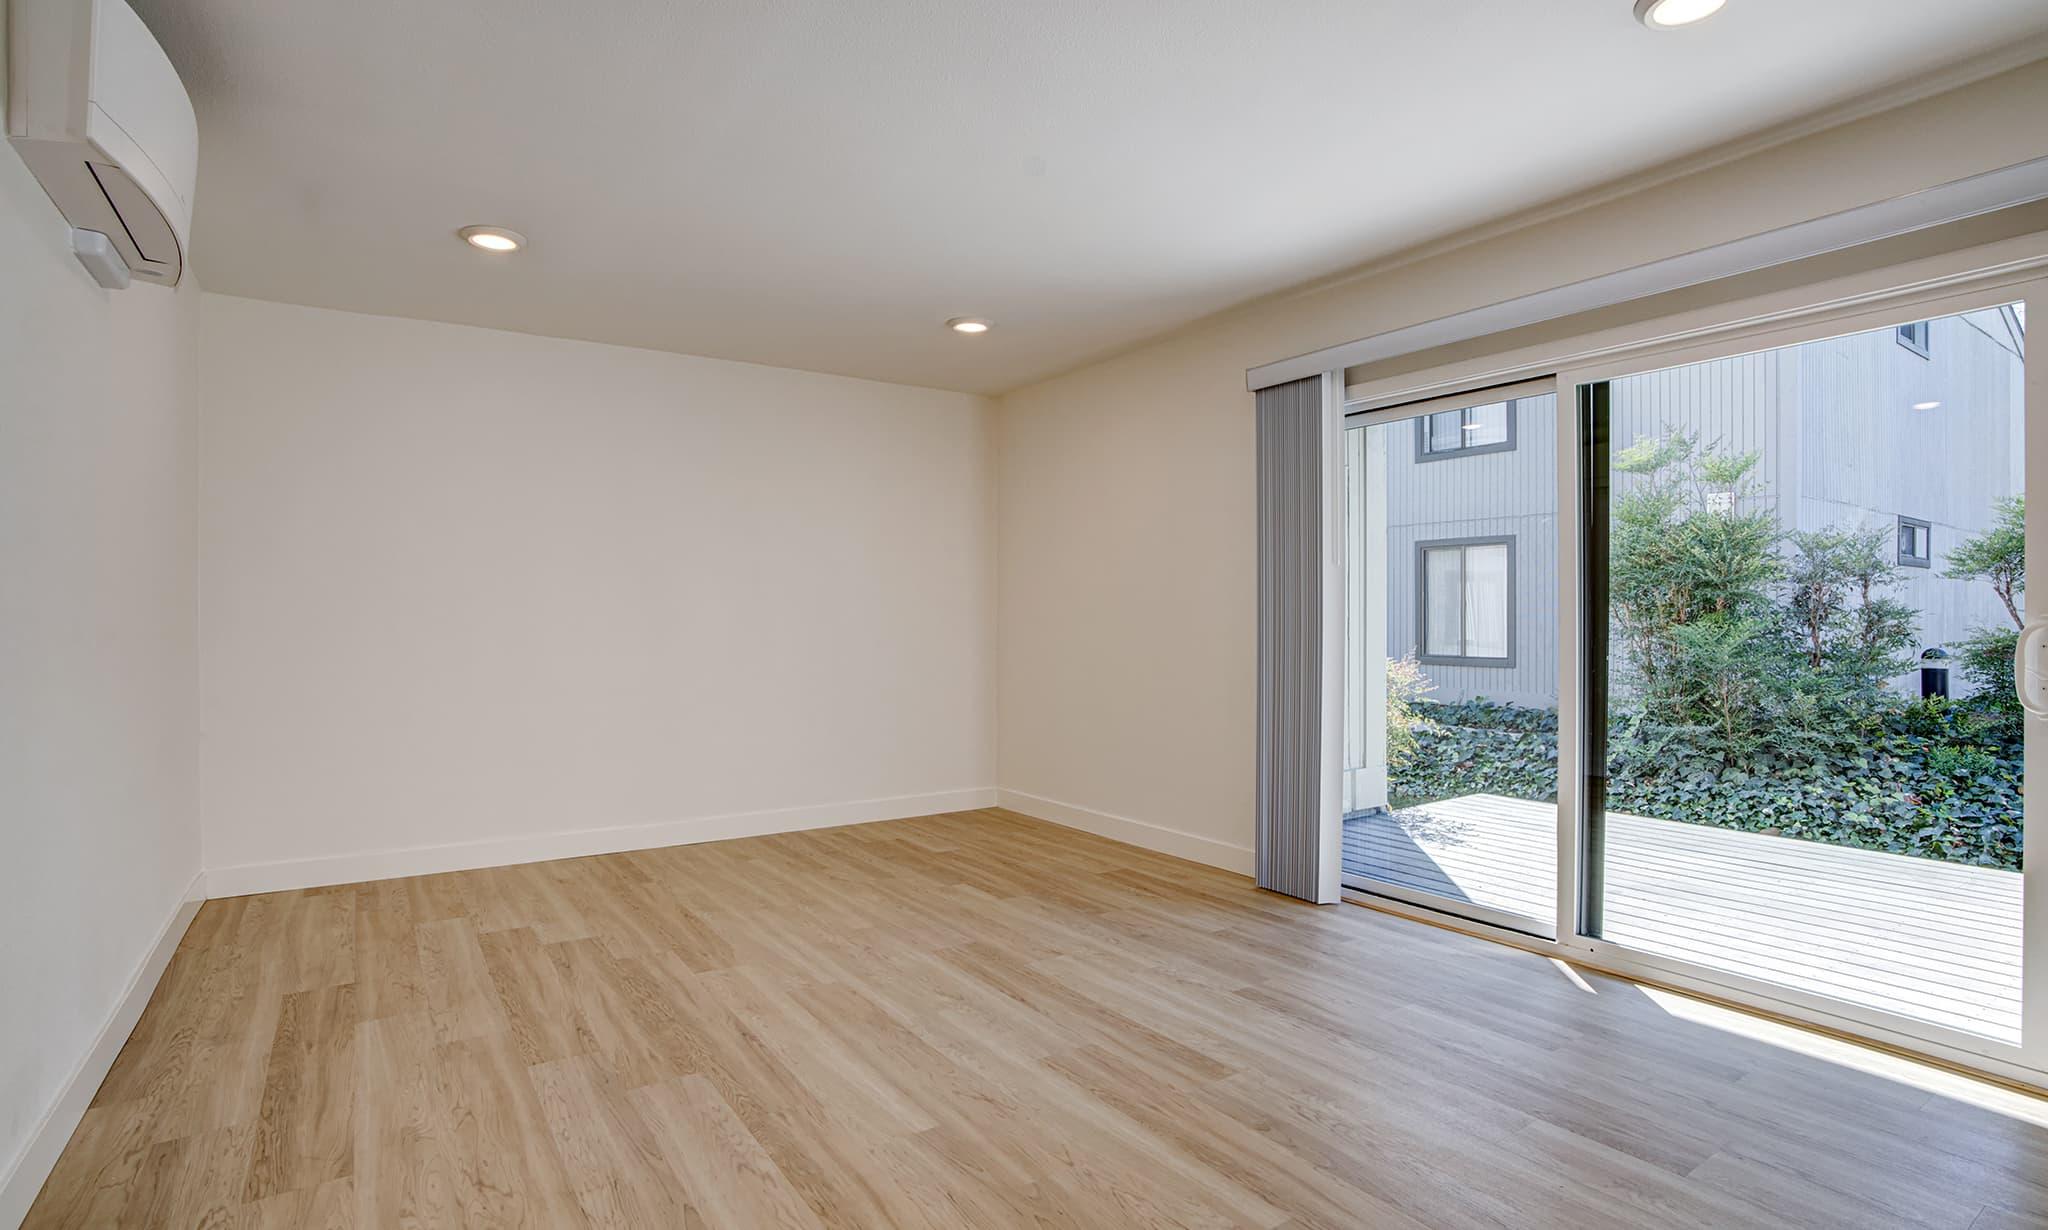 Boardwalk Apartments apartments in Santa Clara CA to rent photo 8